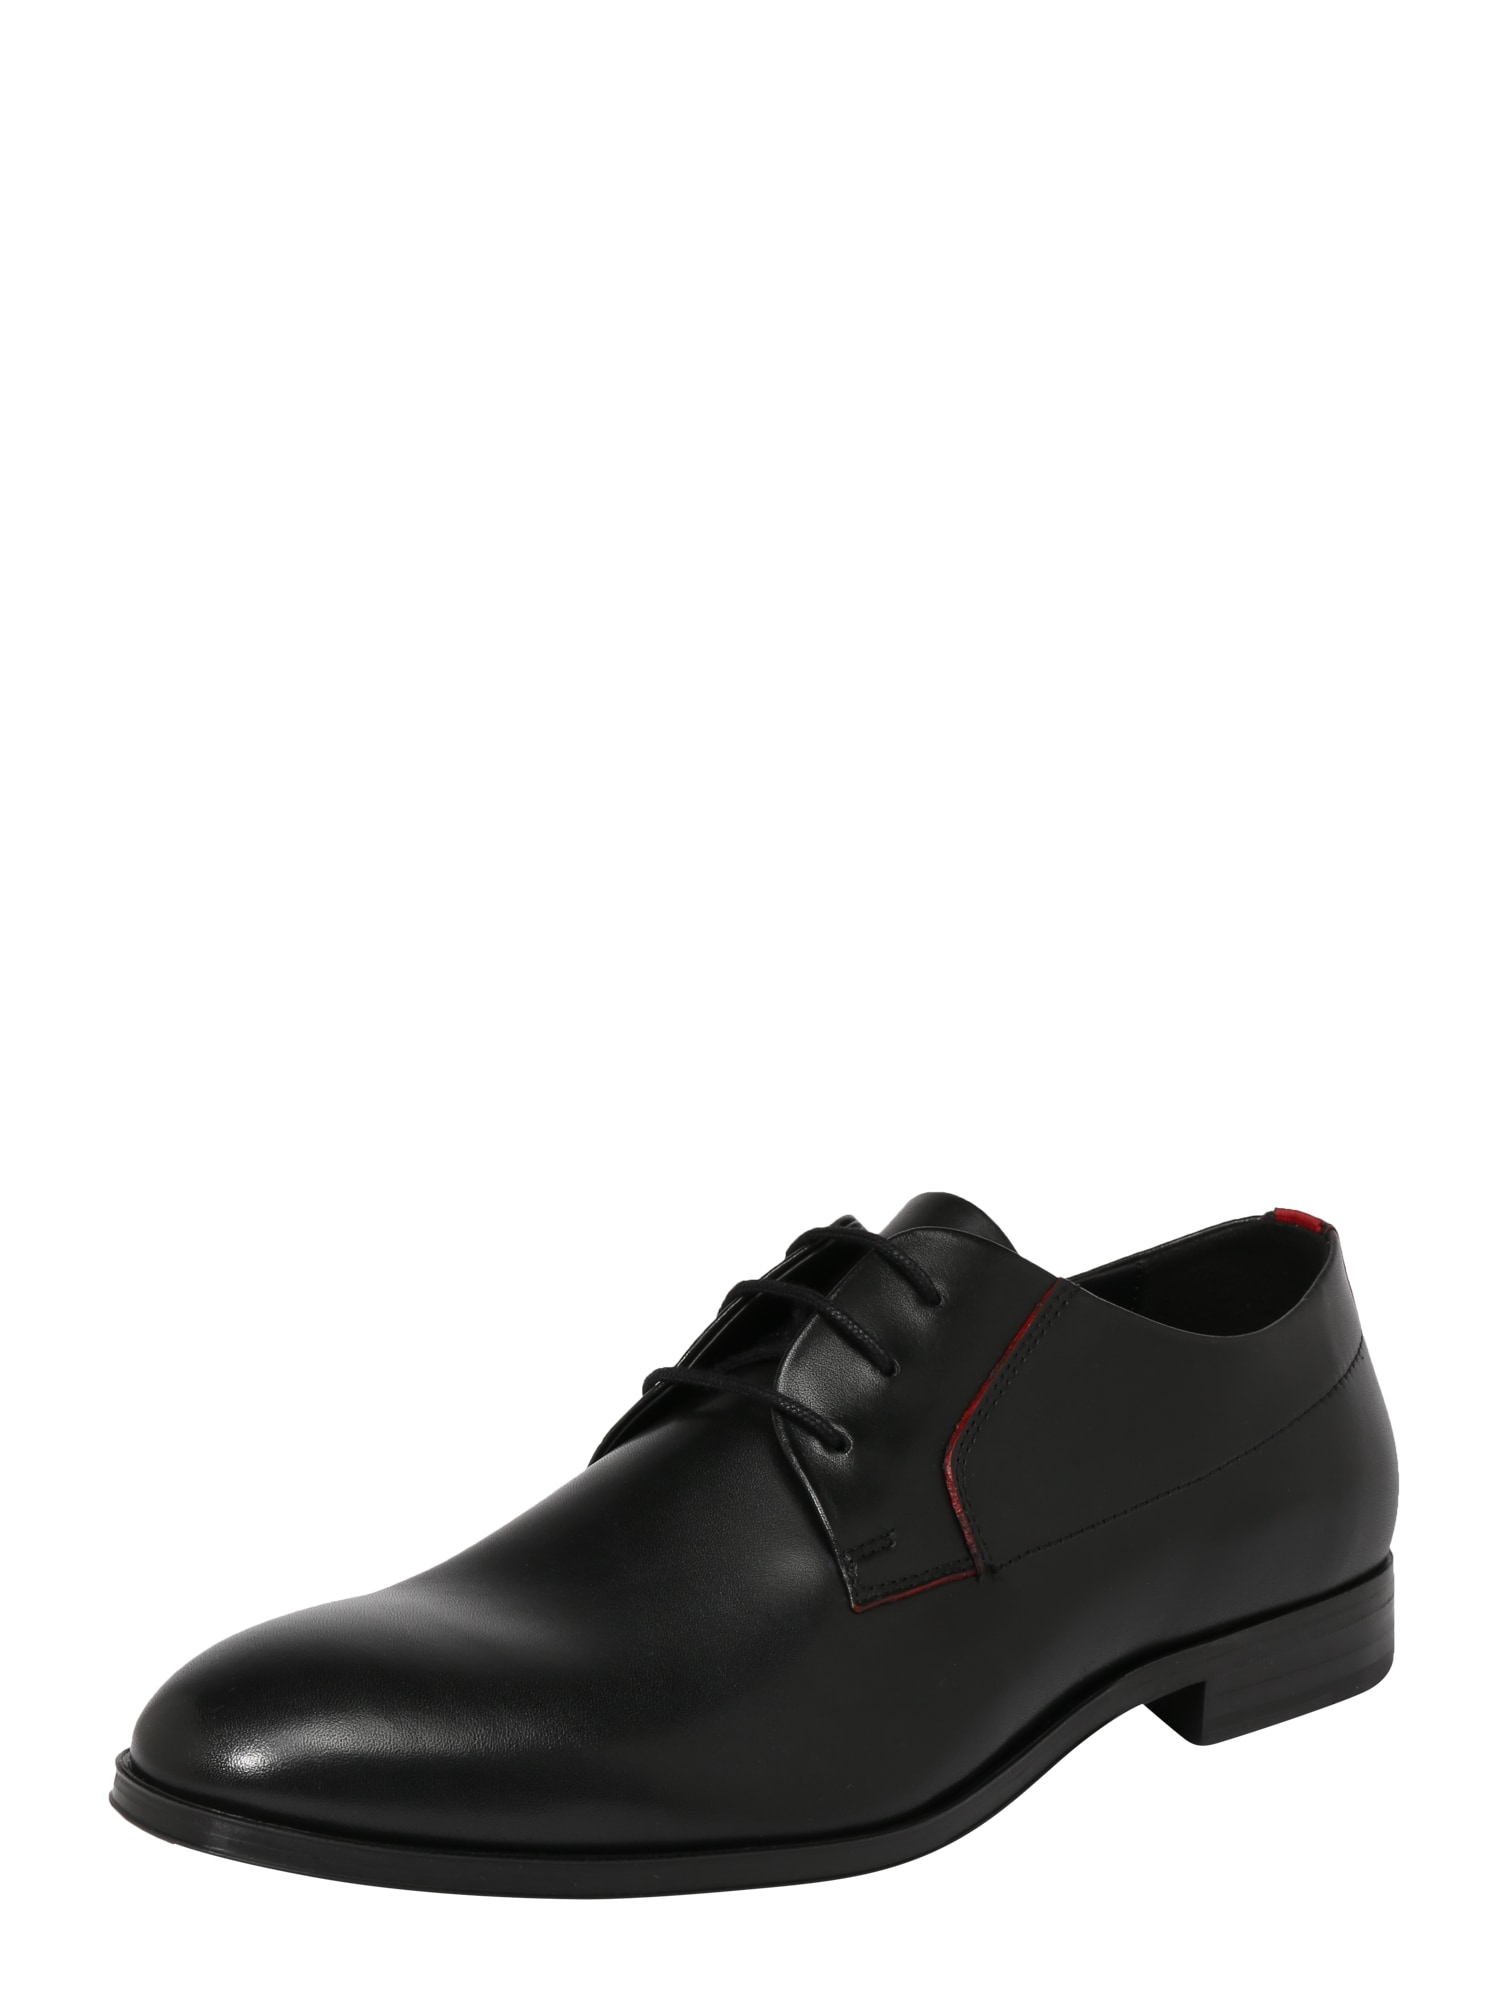 Šněrovací boty Boheme Derb ltre červená černá HUGO